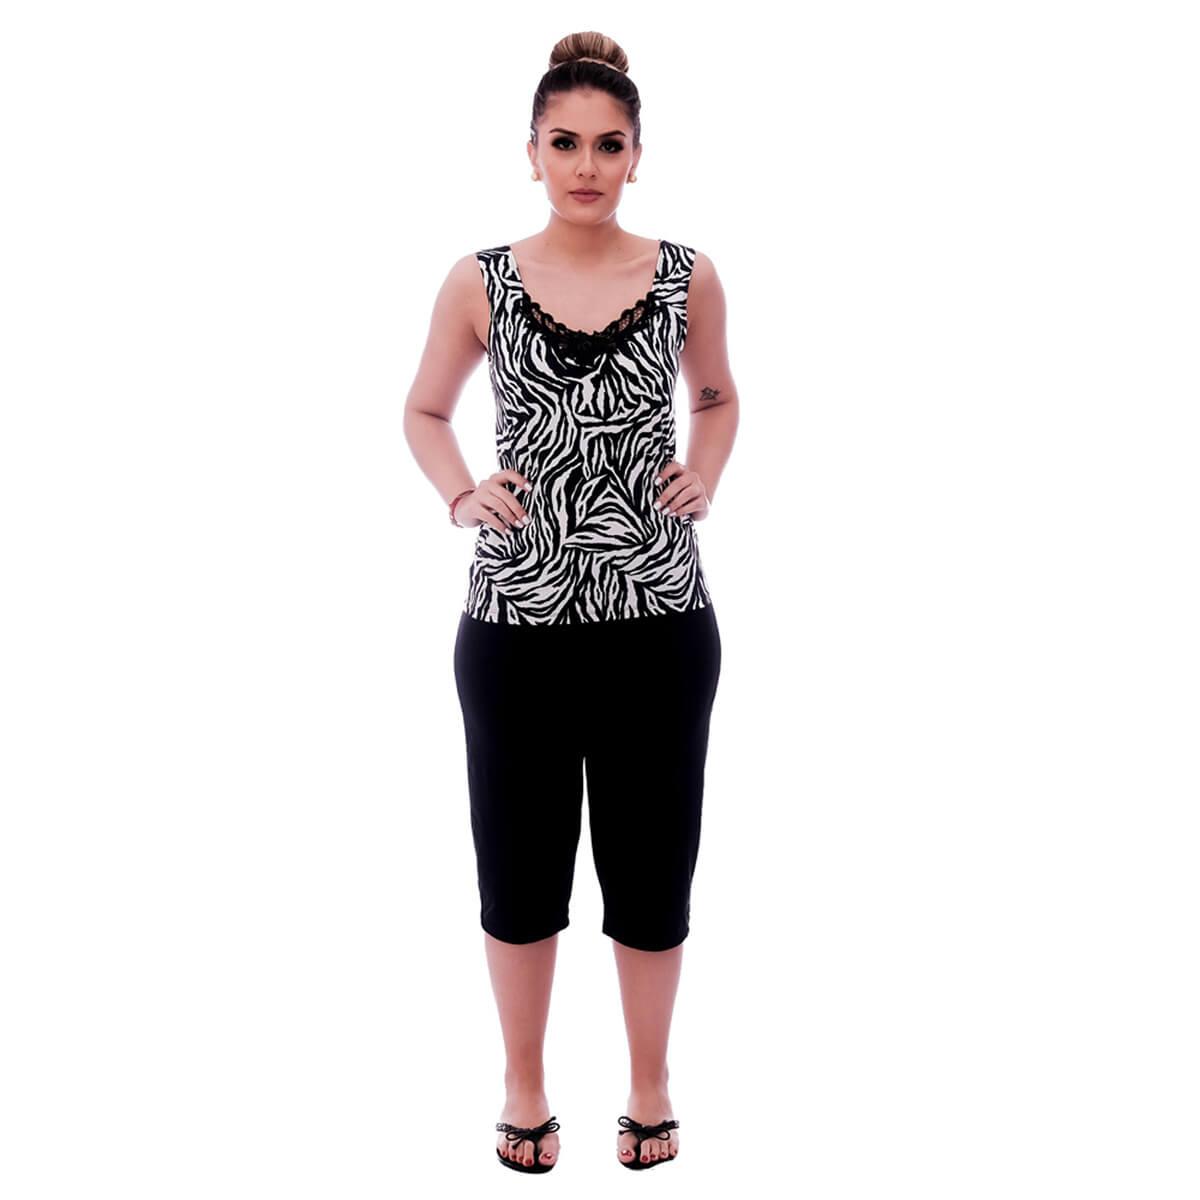 Baby Doll de Blusa Alça Estampa Animal Print de Zebra com Renda Gripir Preta no Decote e Bermuda Midi Preta